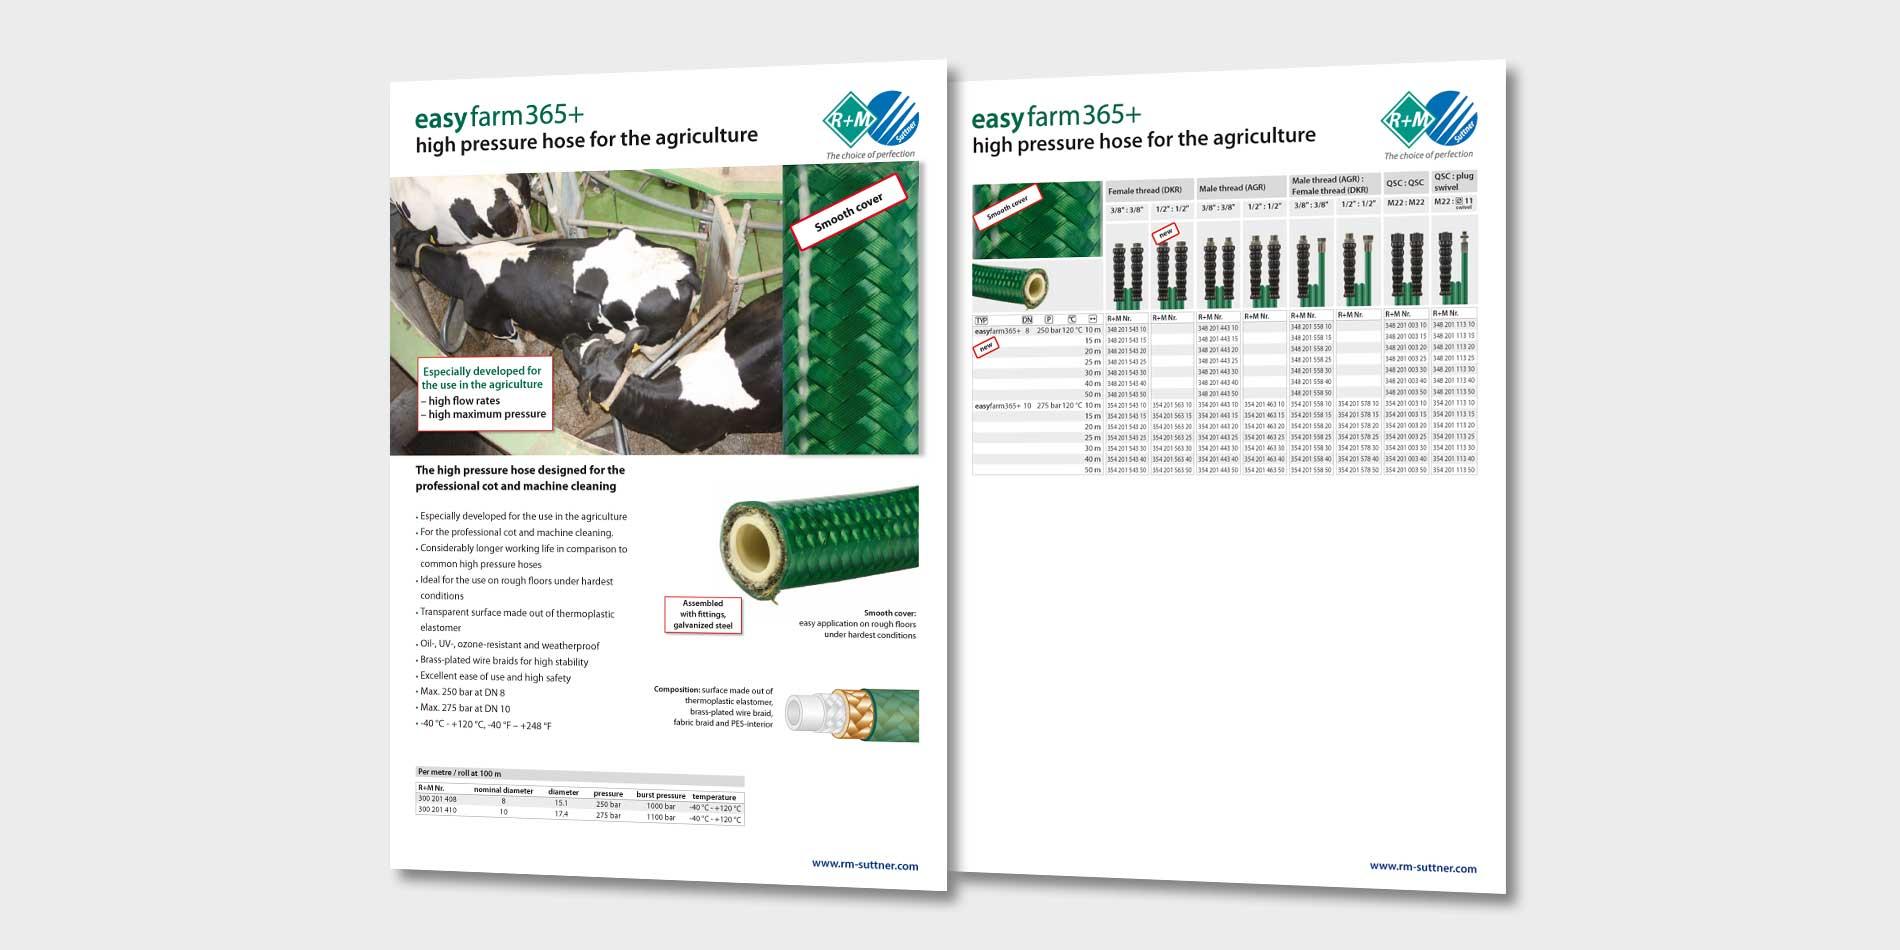 easyfarm365+ High pressure hoses for the agriculture